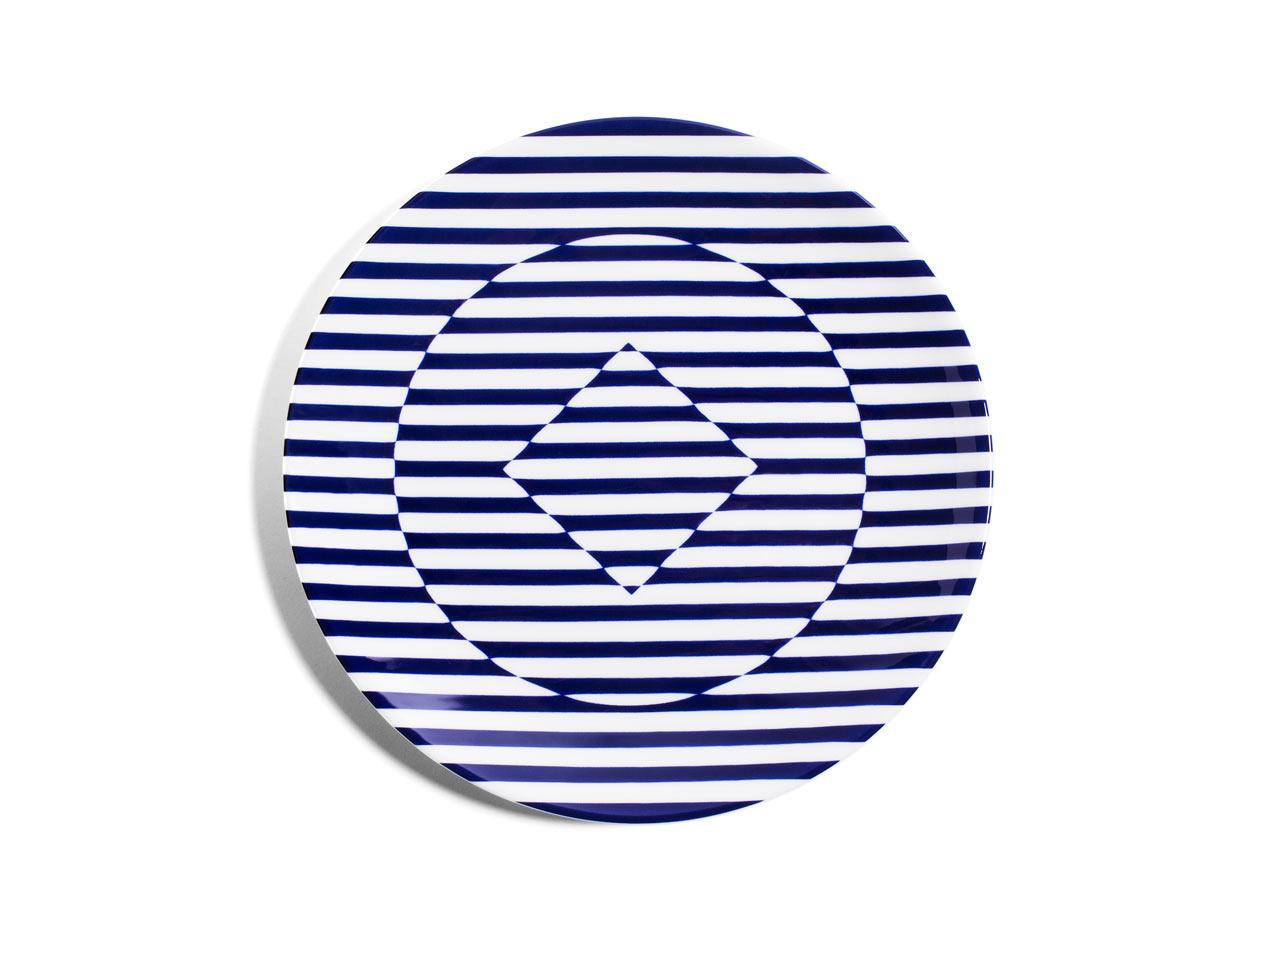 Patternity-Richard-Brendon-6-Reason